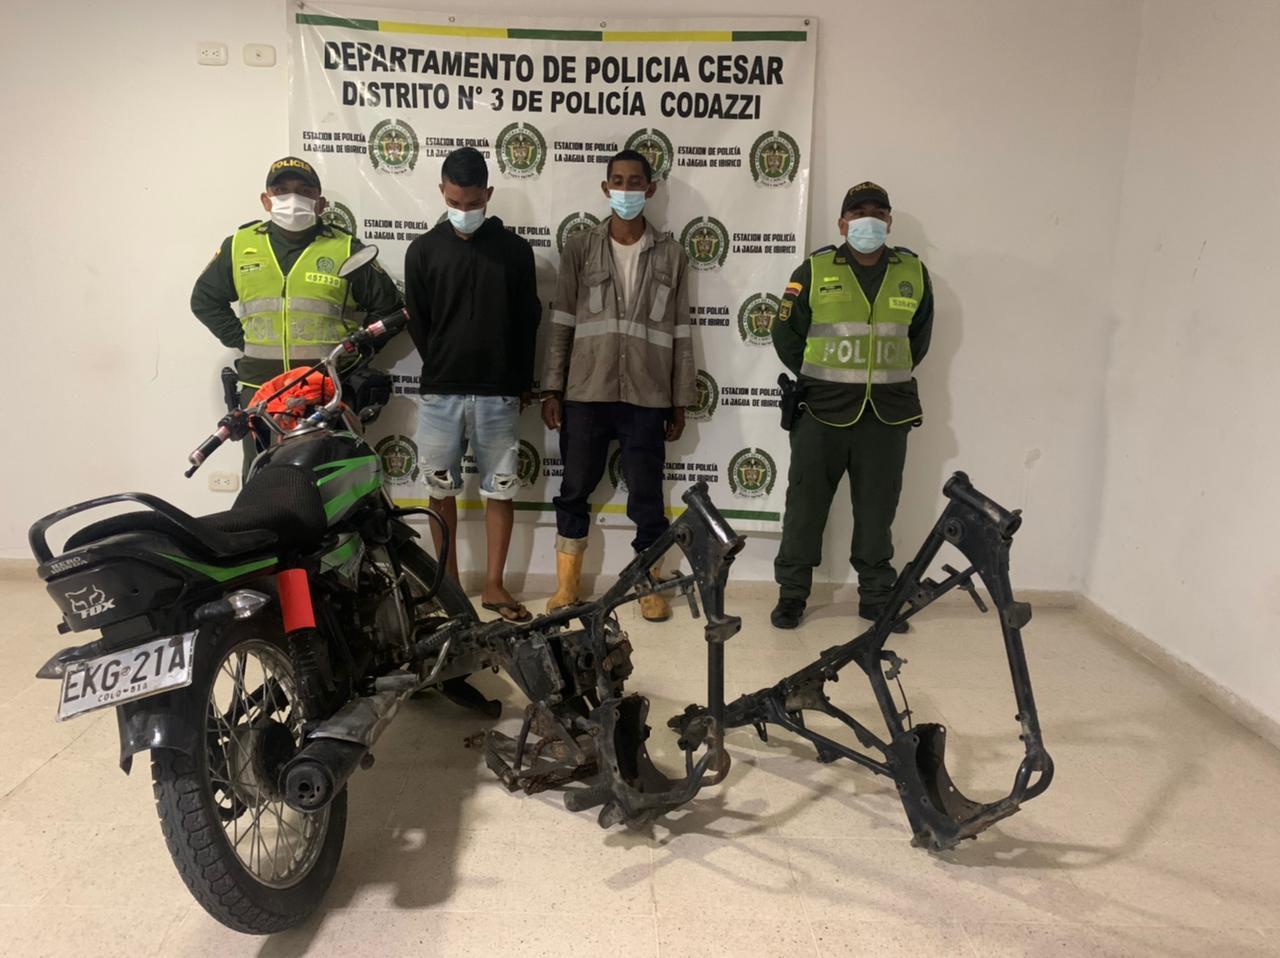 hoyennoticia.com, Vendían partes de motos robadas